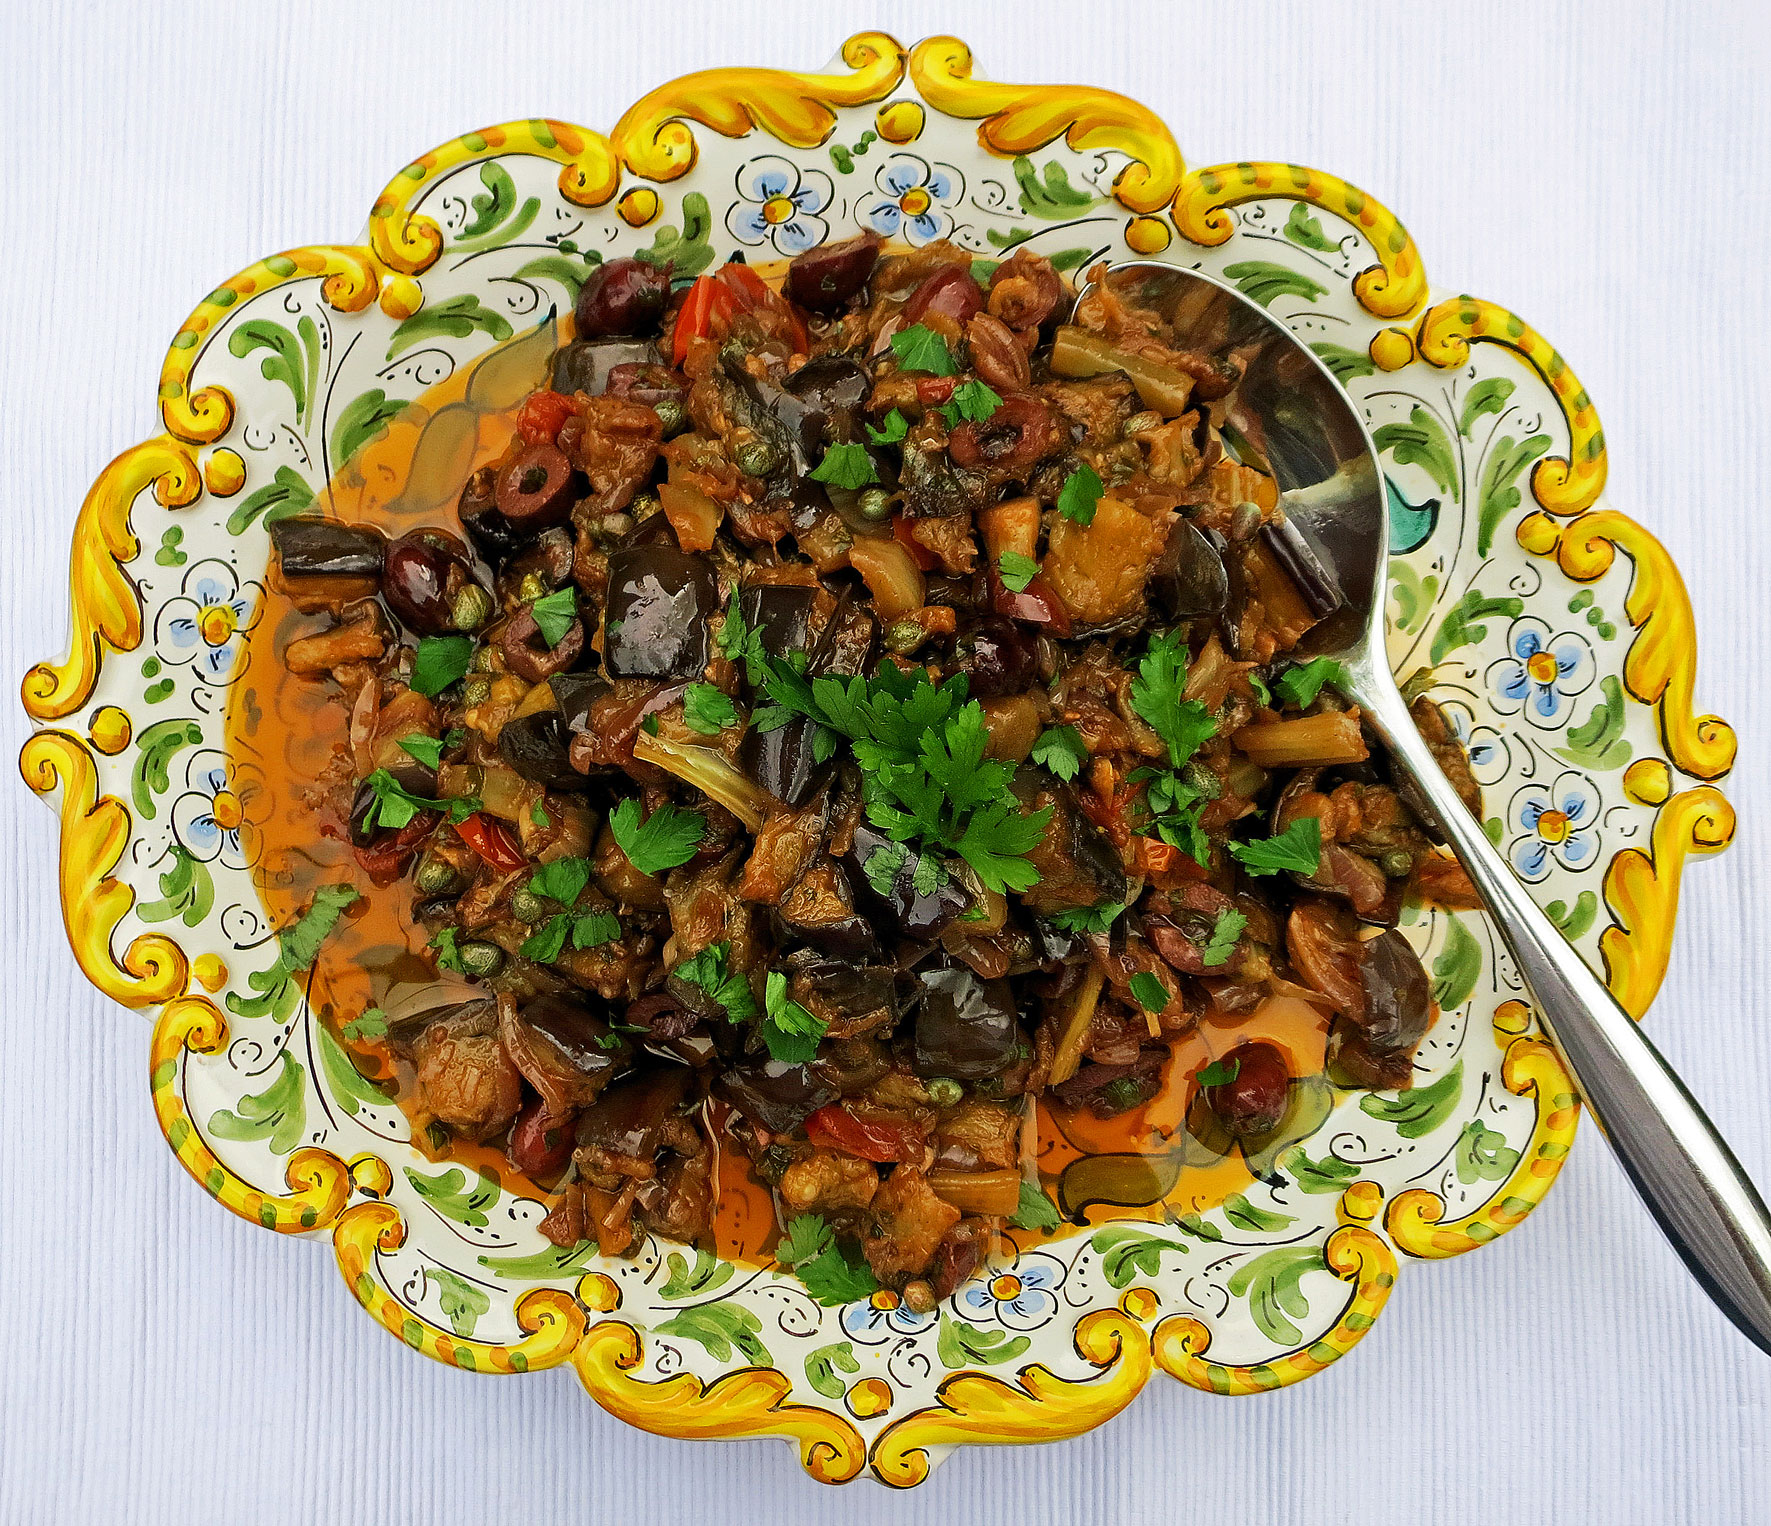 Caponata (Sicilian slow cooked aubergines)